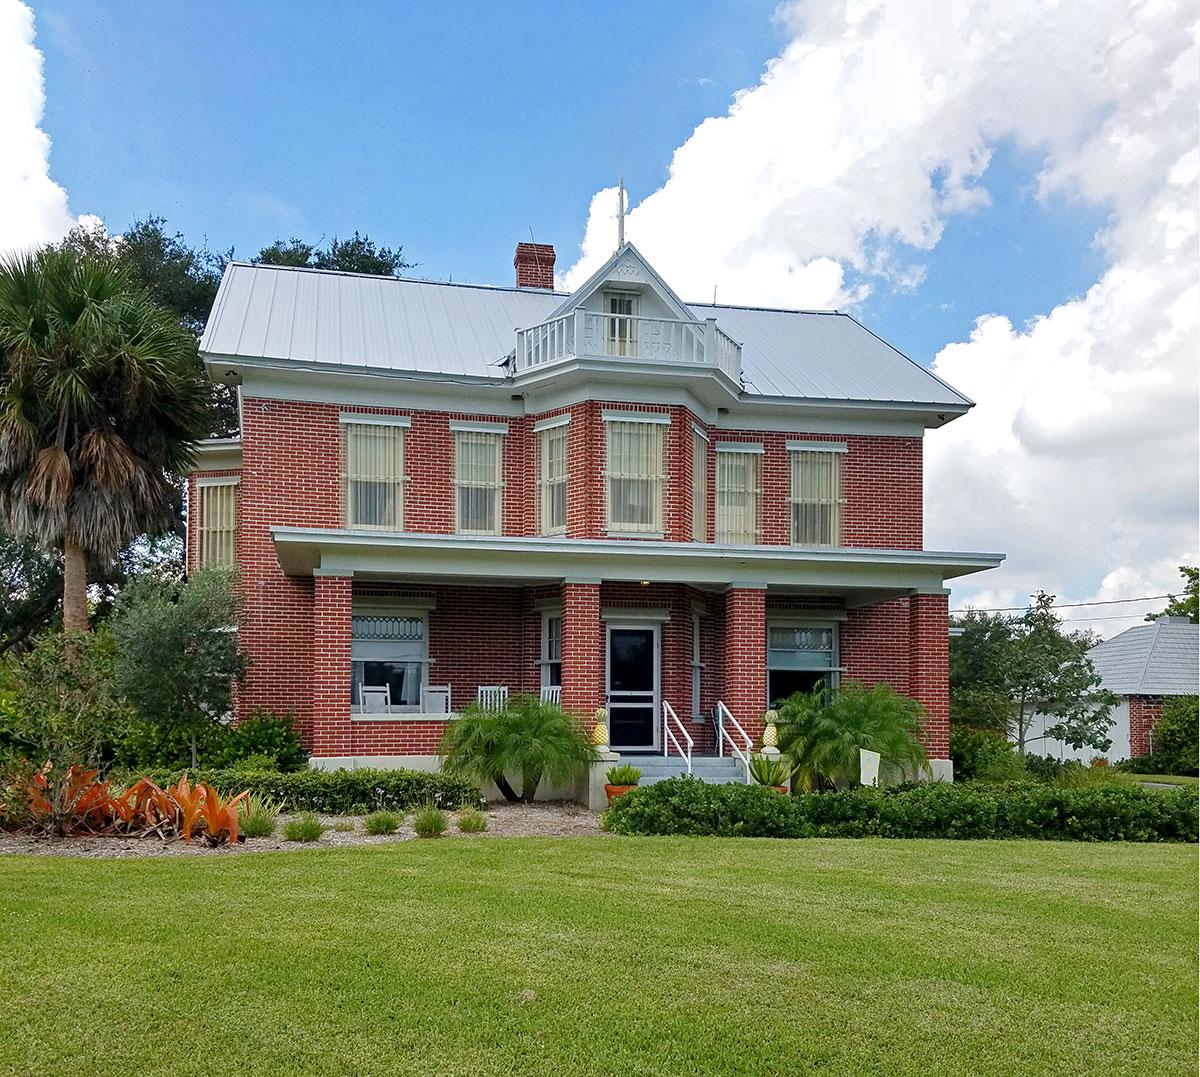 The Hallstrom House